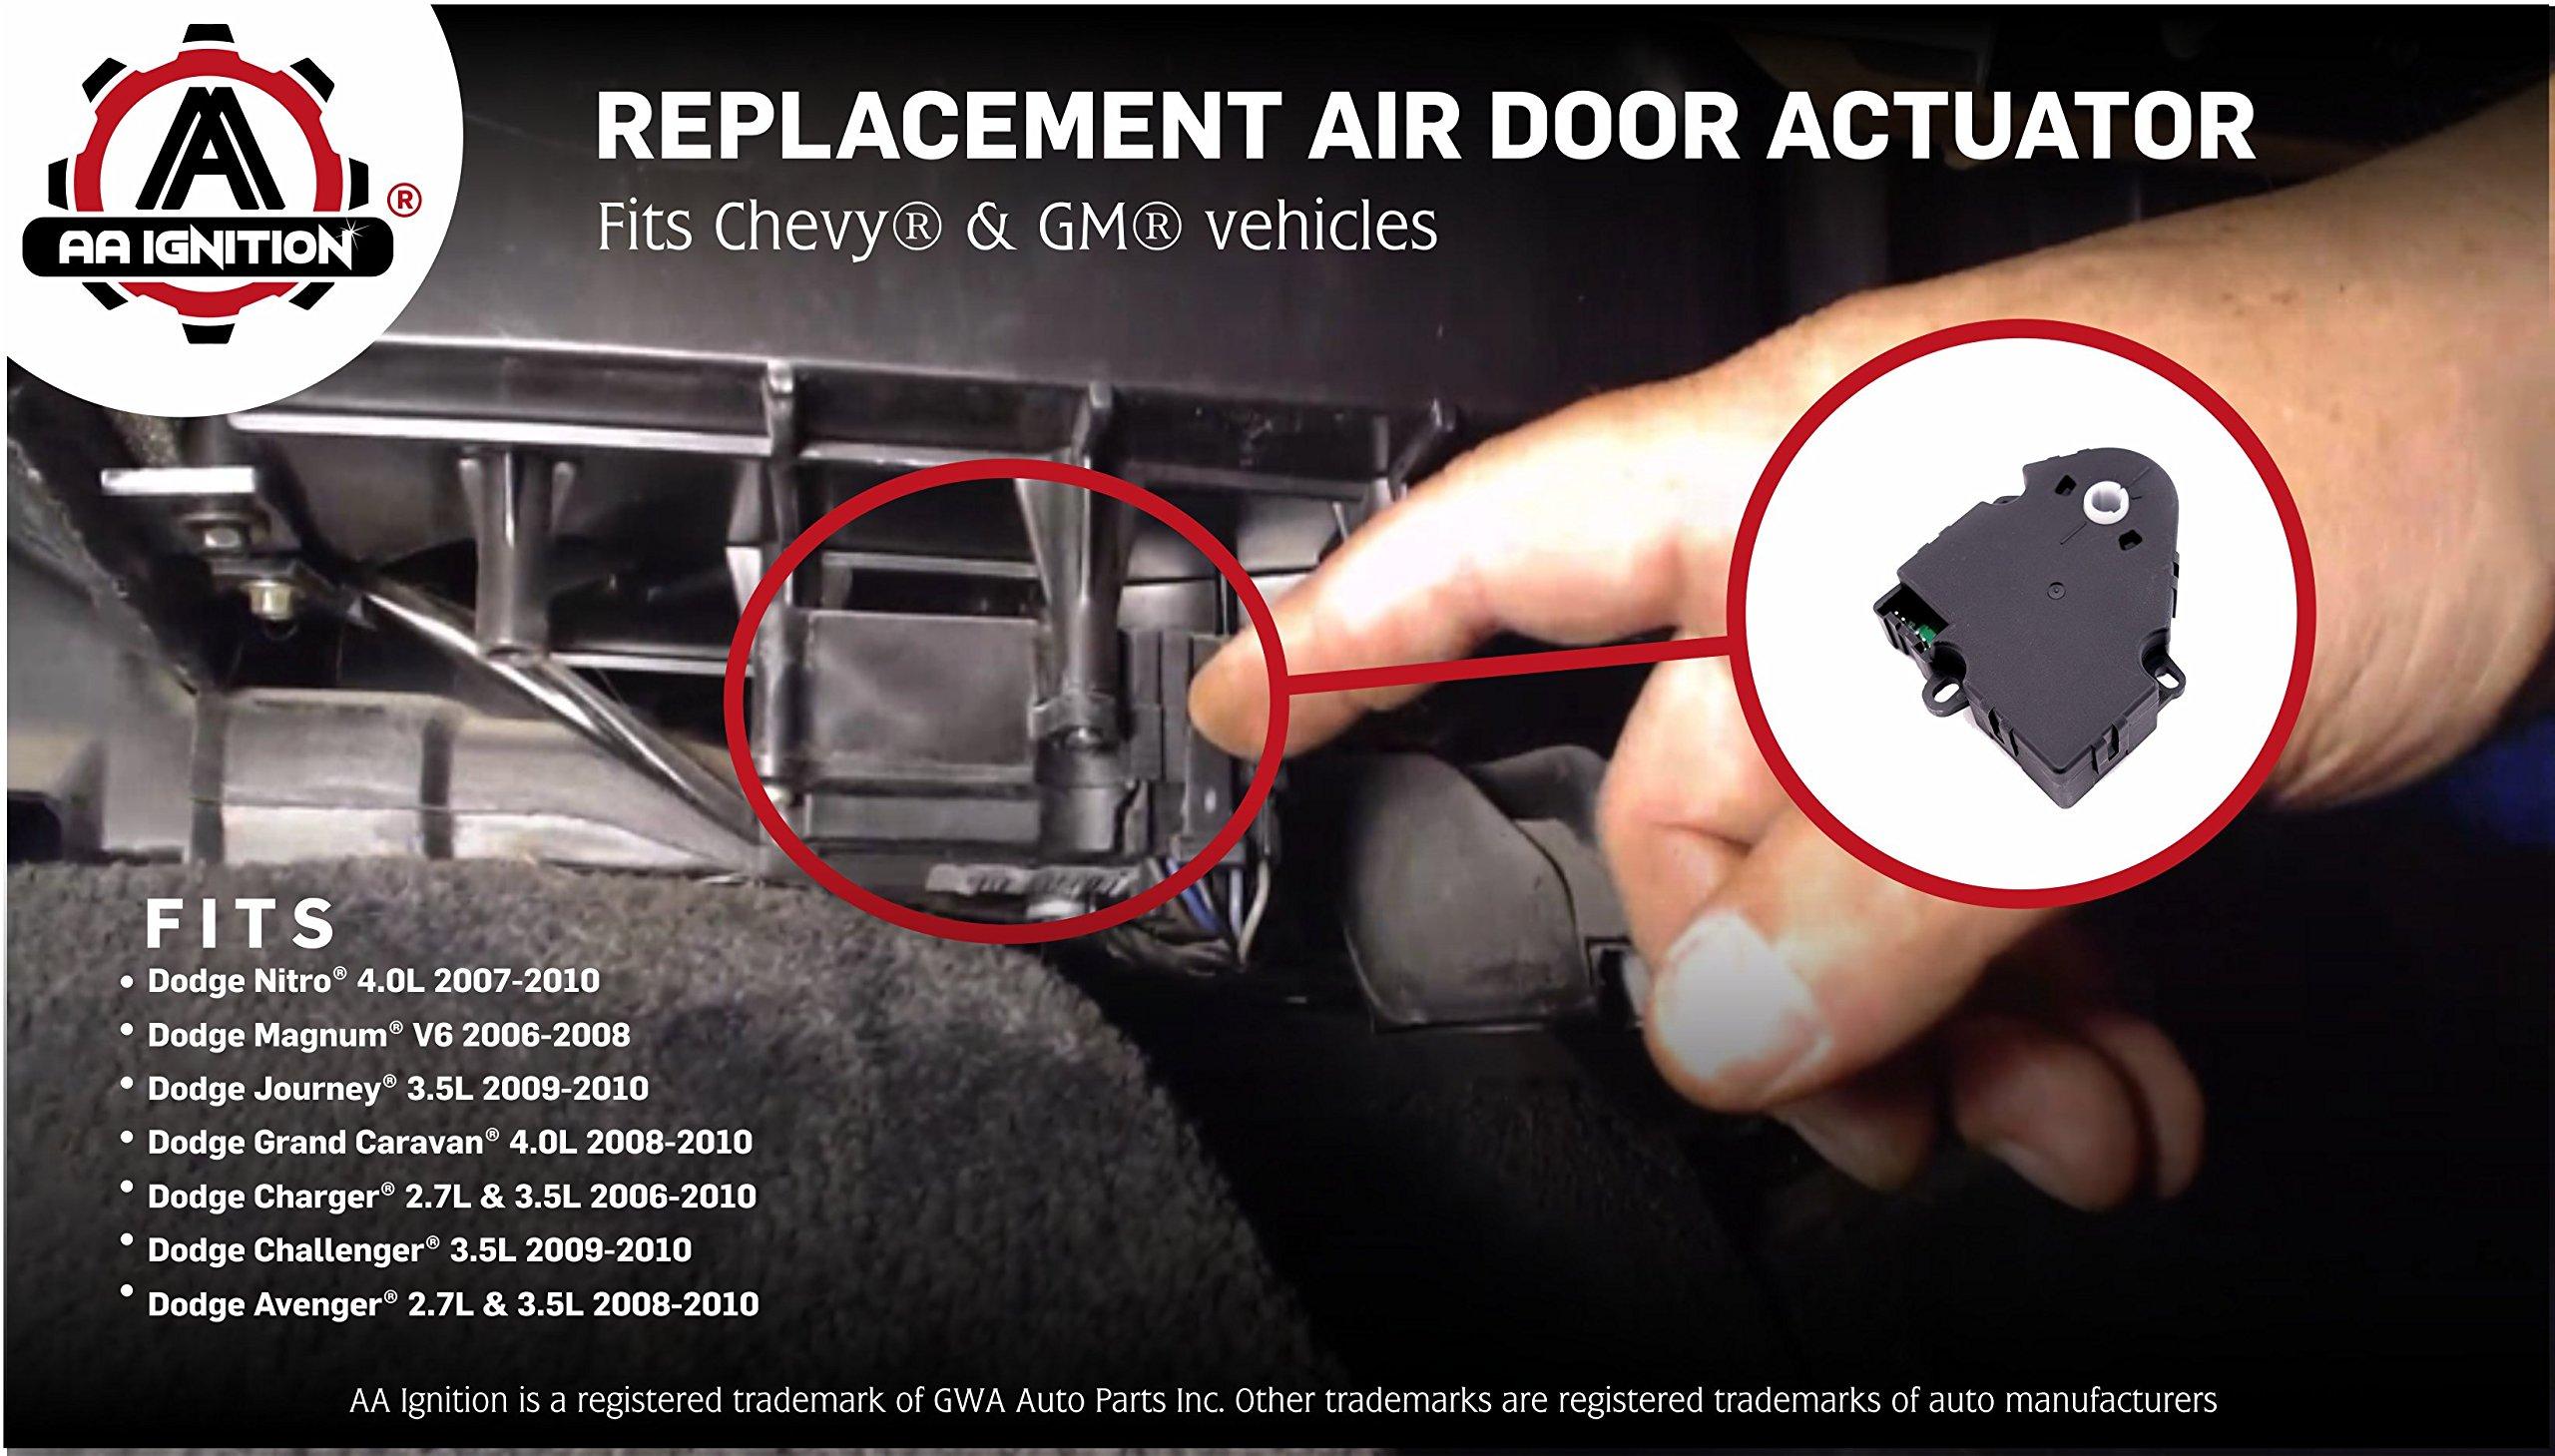 Amazon Com Hvac Blend Door Actuator Replaces 604107 16124932 16177412 604 107 Compatible With Chevy Gmc Vehicles And More Tahoe Malibu Monte Carlo Corvette K1500 Suburban Yukon Regal Automotive